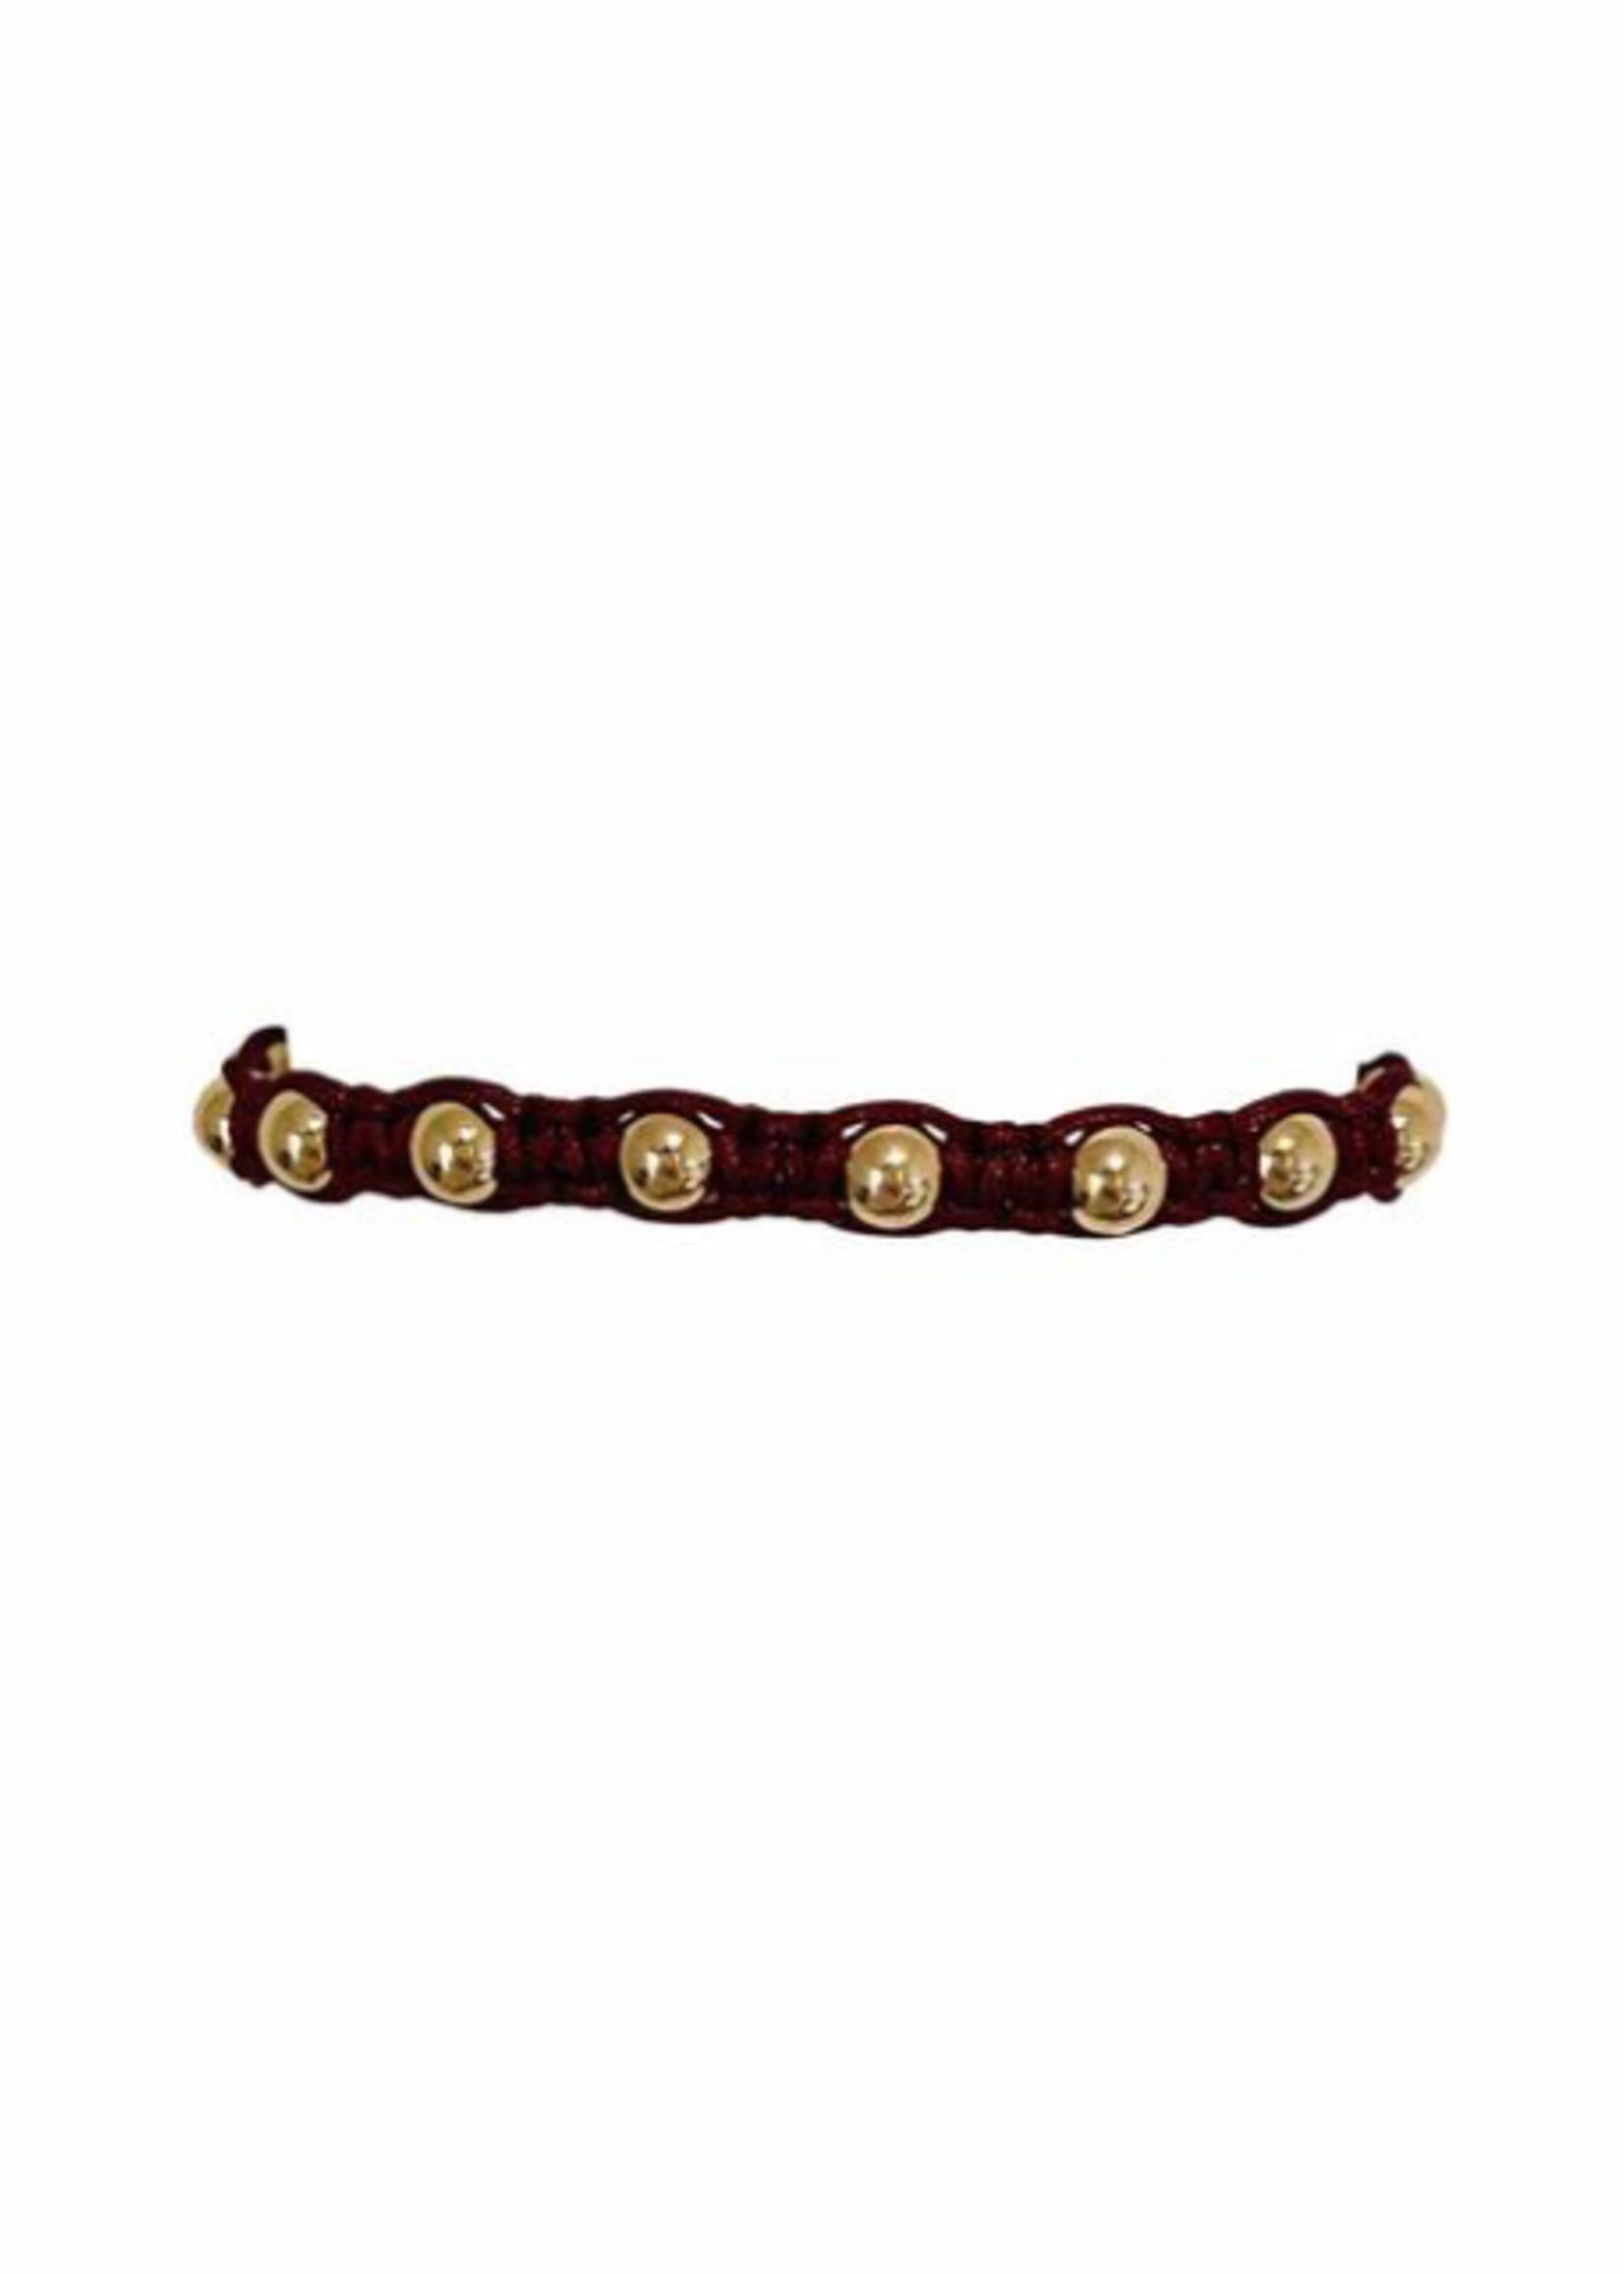 Garnet Macrame Bracelet